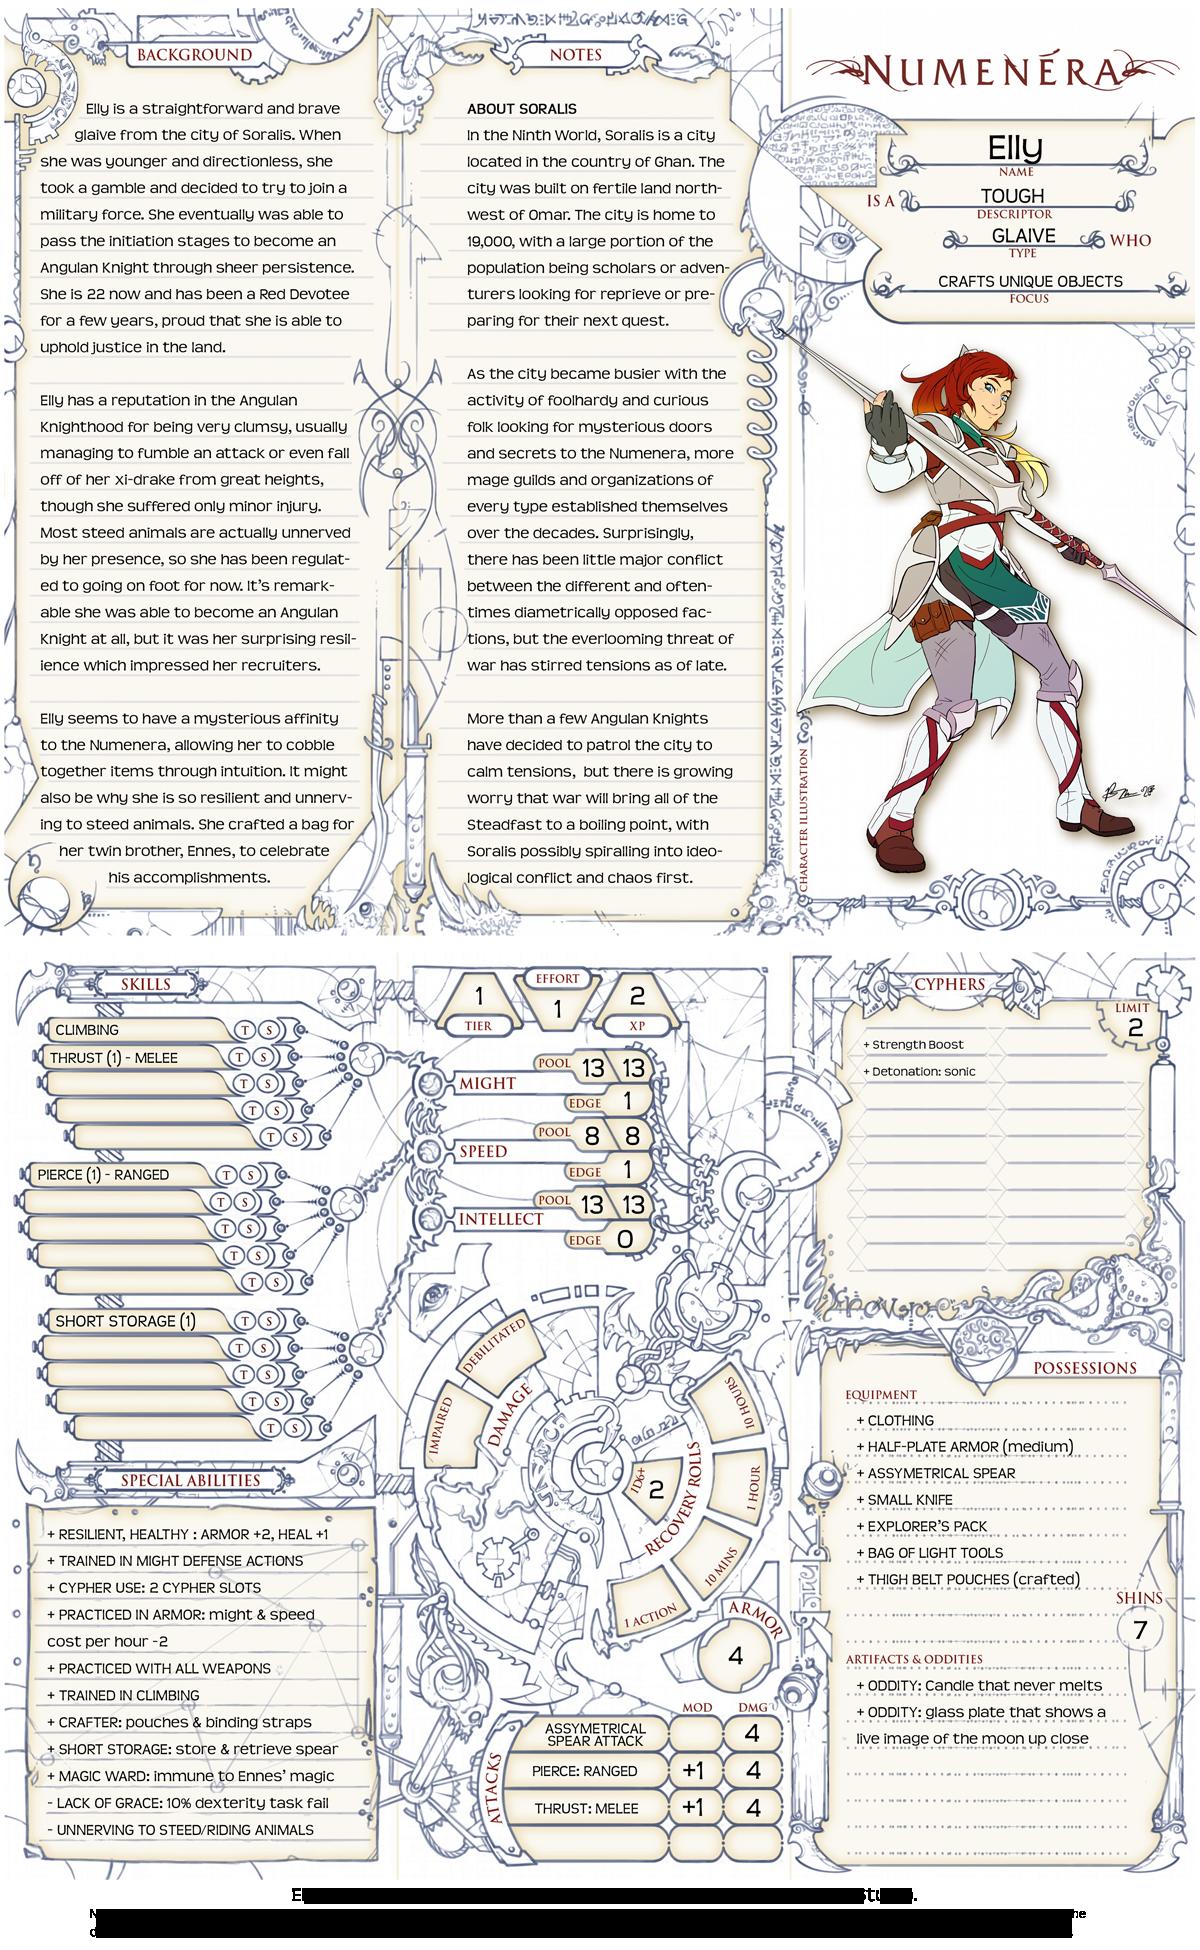 Numenera Sheet by Tensen01 on DeviantArt